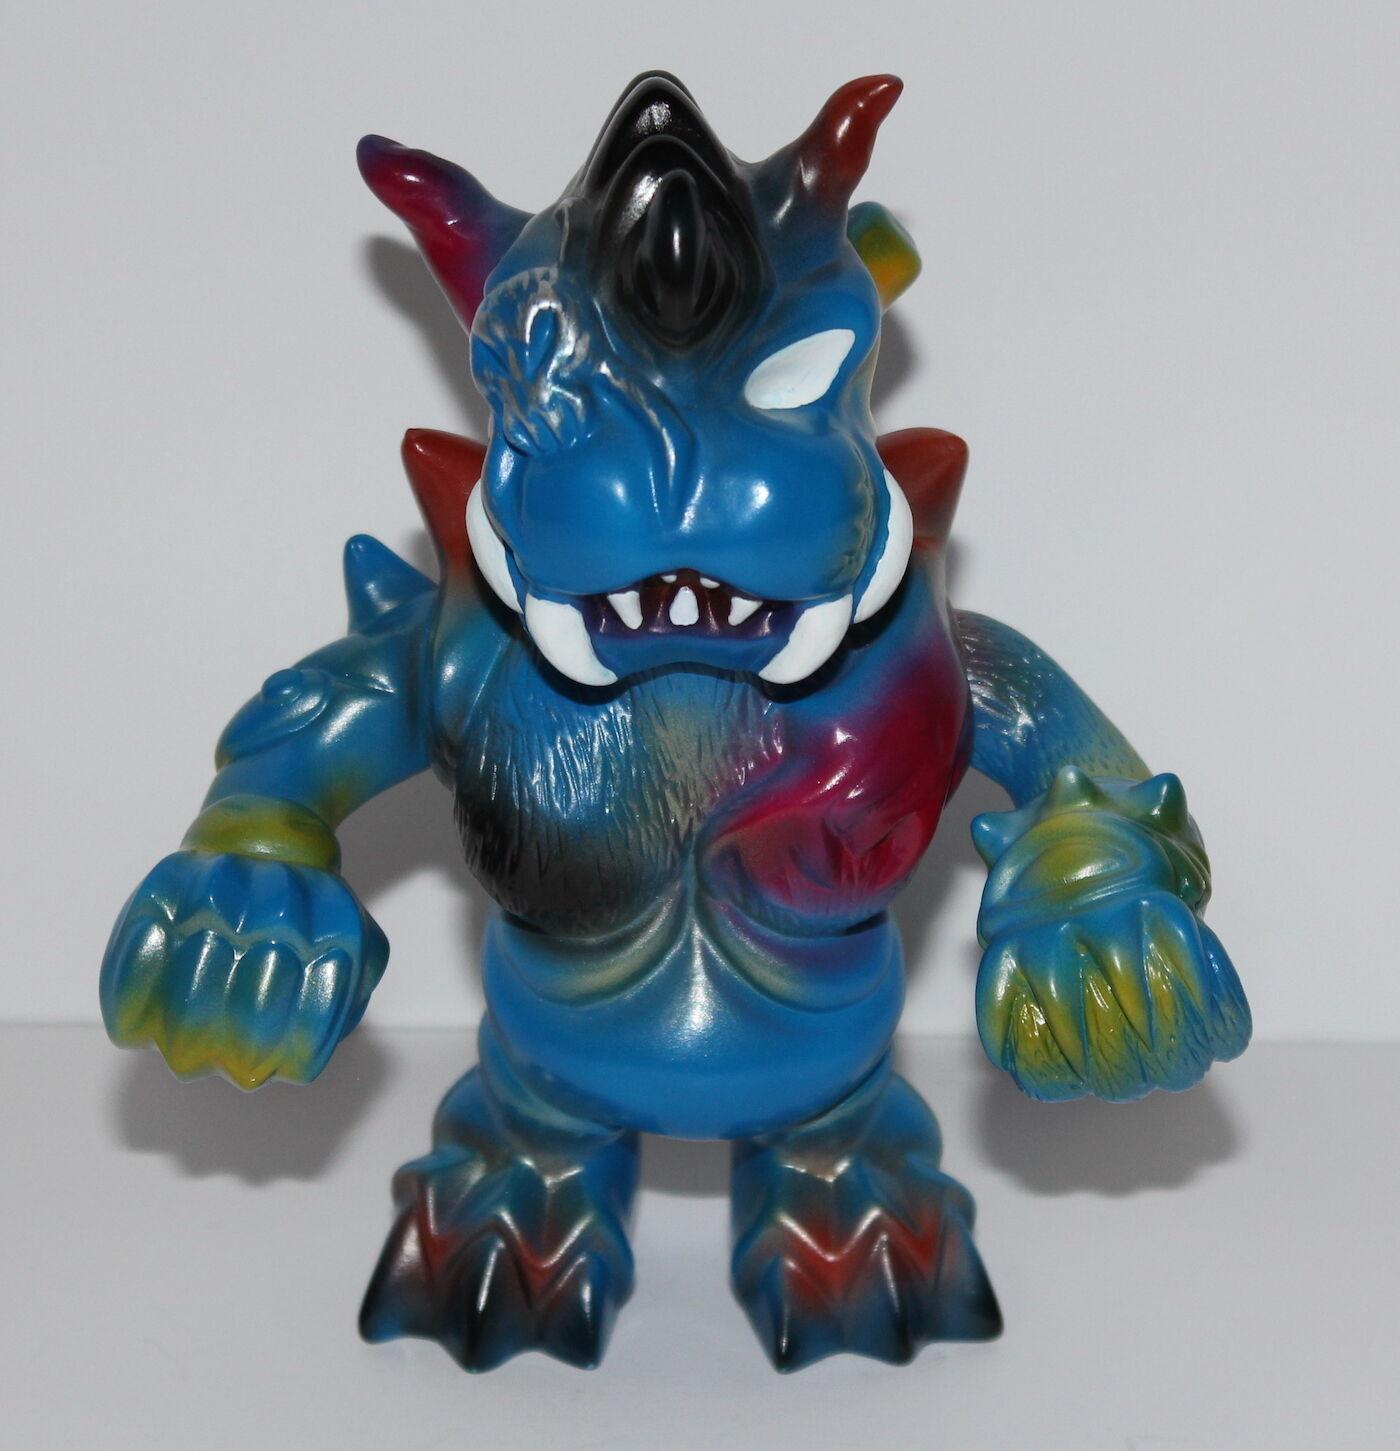 Cronic Bakurasu Kaiju Figure Toy Collectible